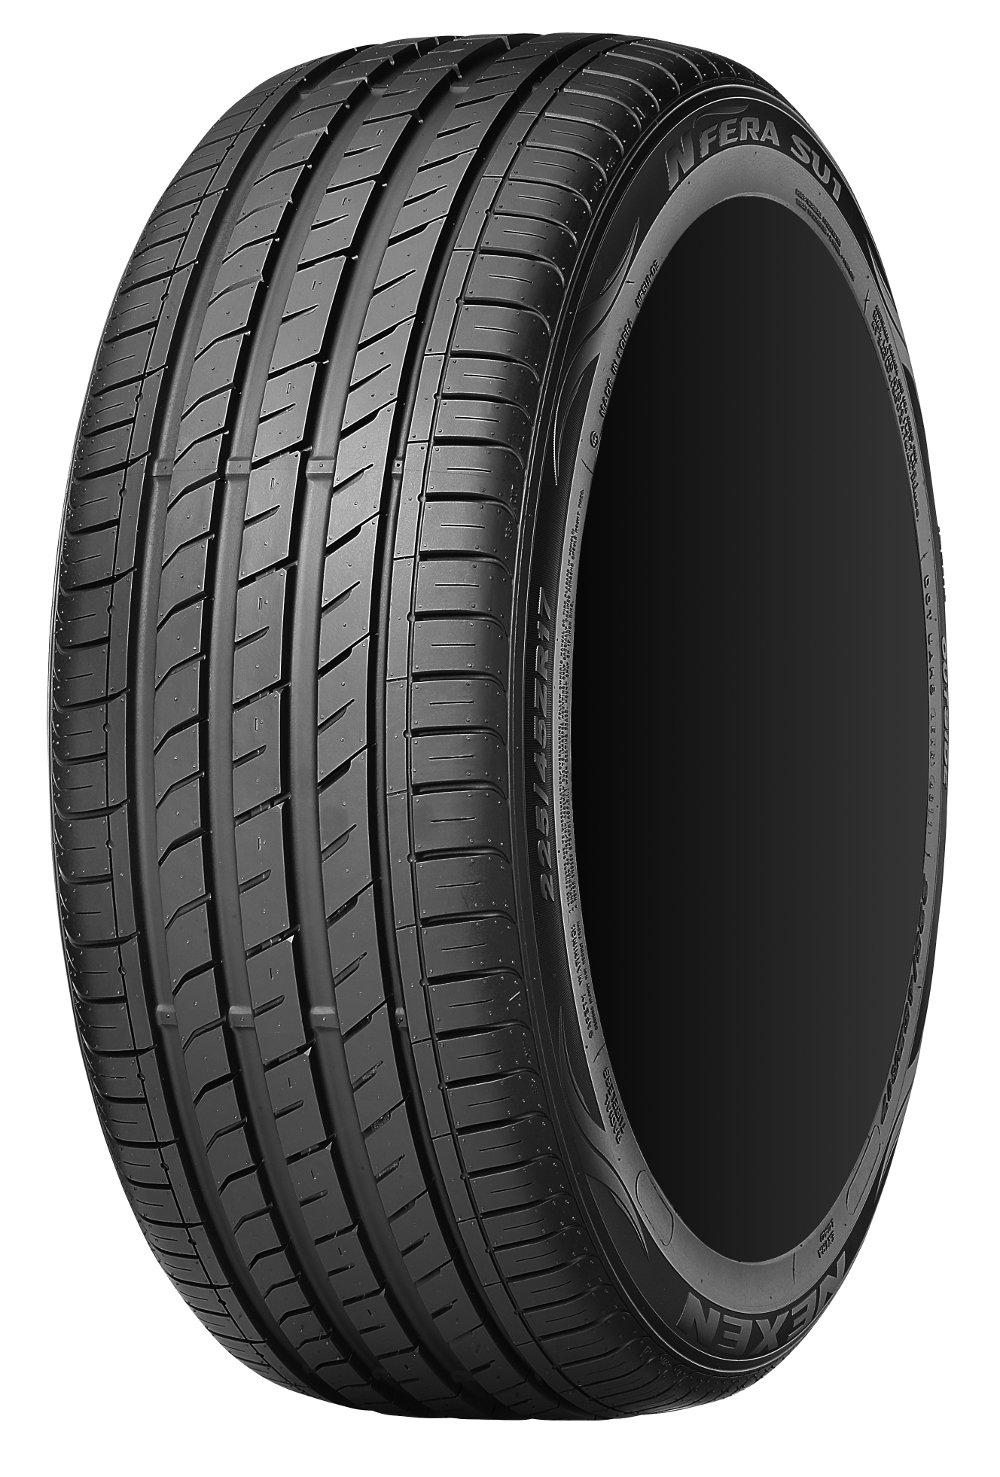 NEXEN (ネクセン) サマータイヤ N-FERA SU1 215/45R16 90V XL 14761NX B01HPXJ1A4